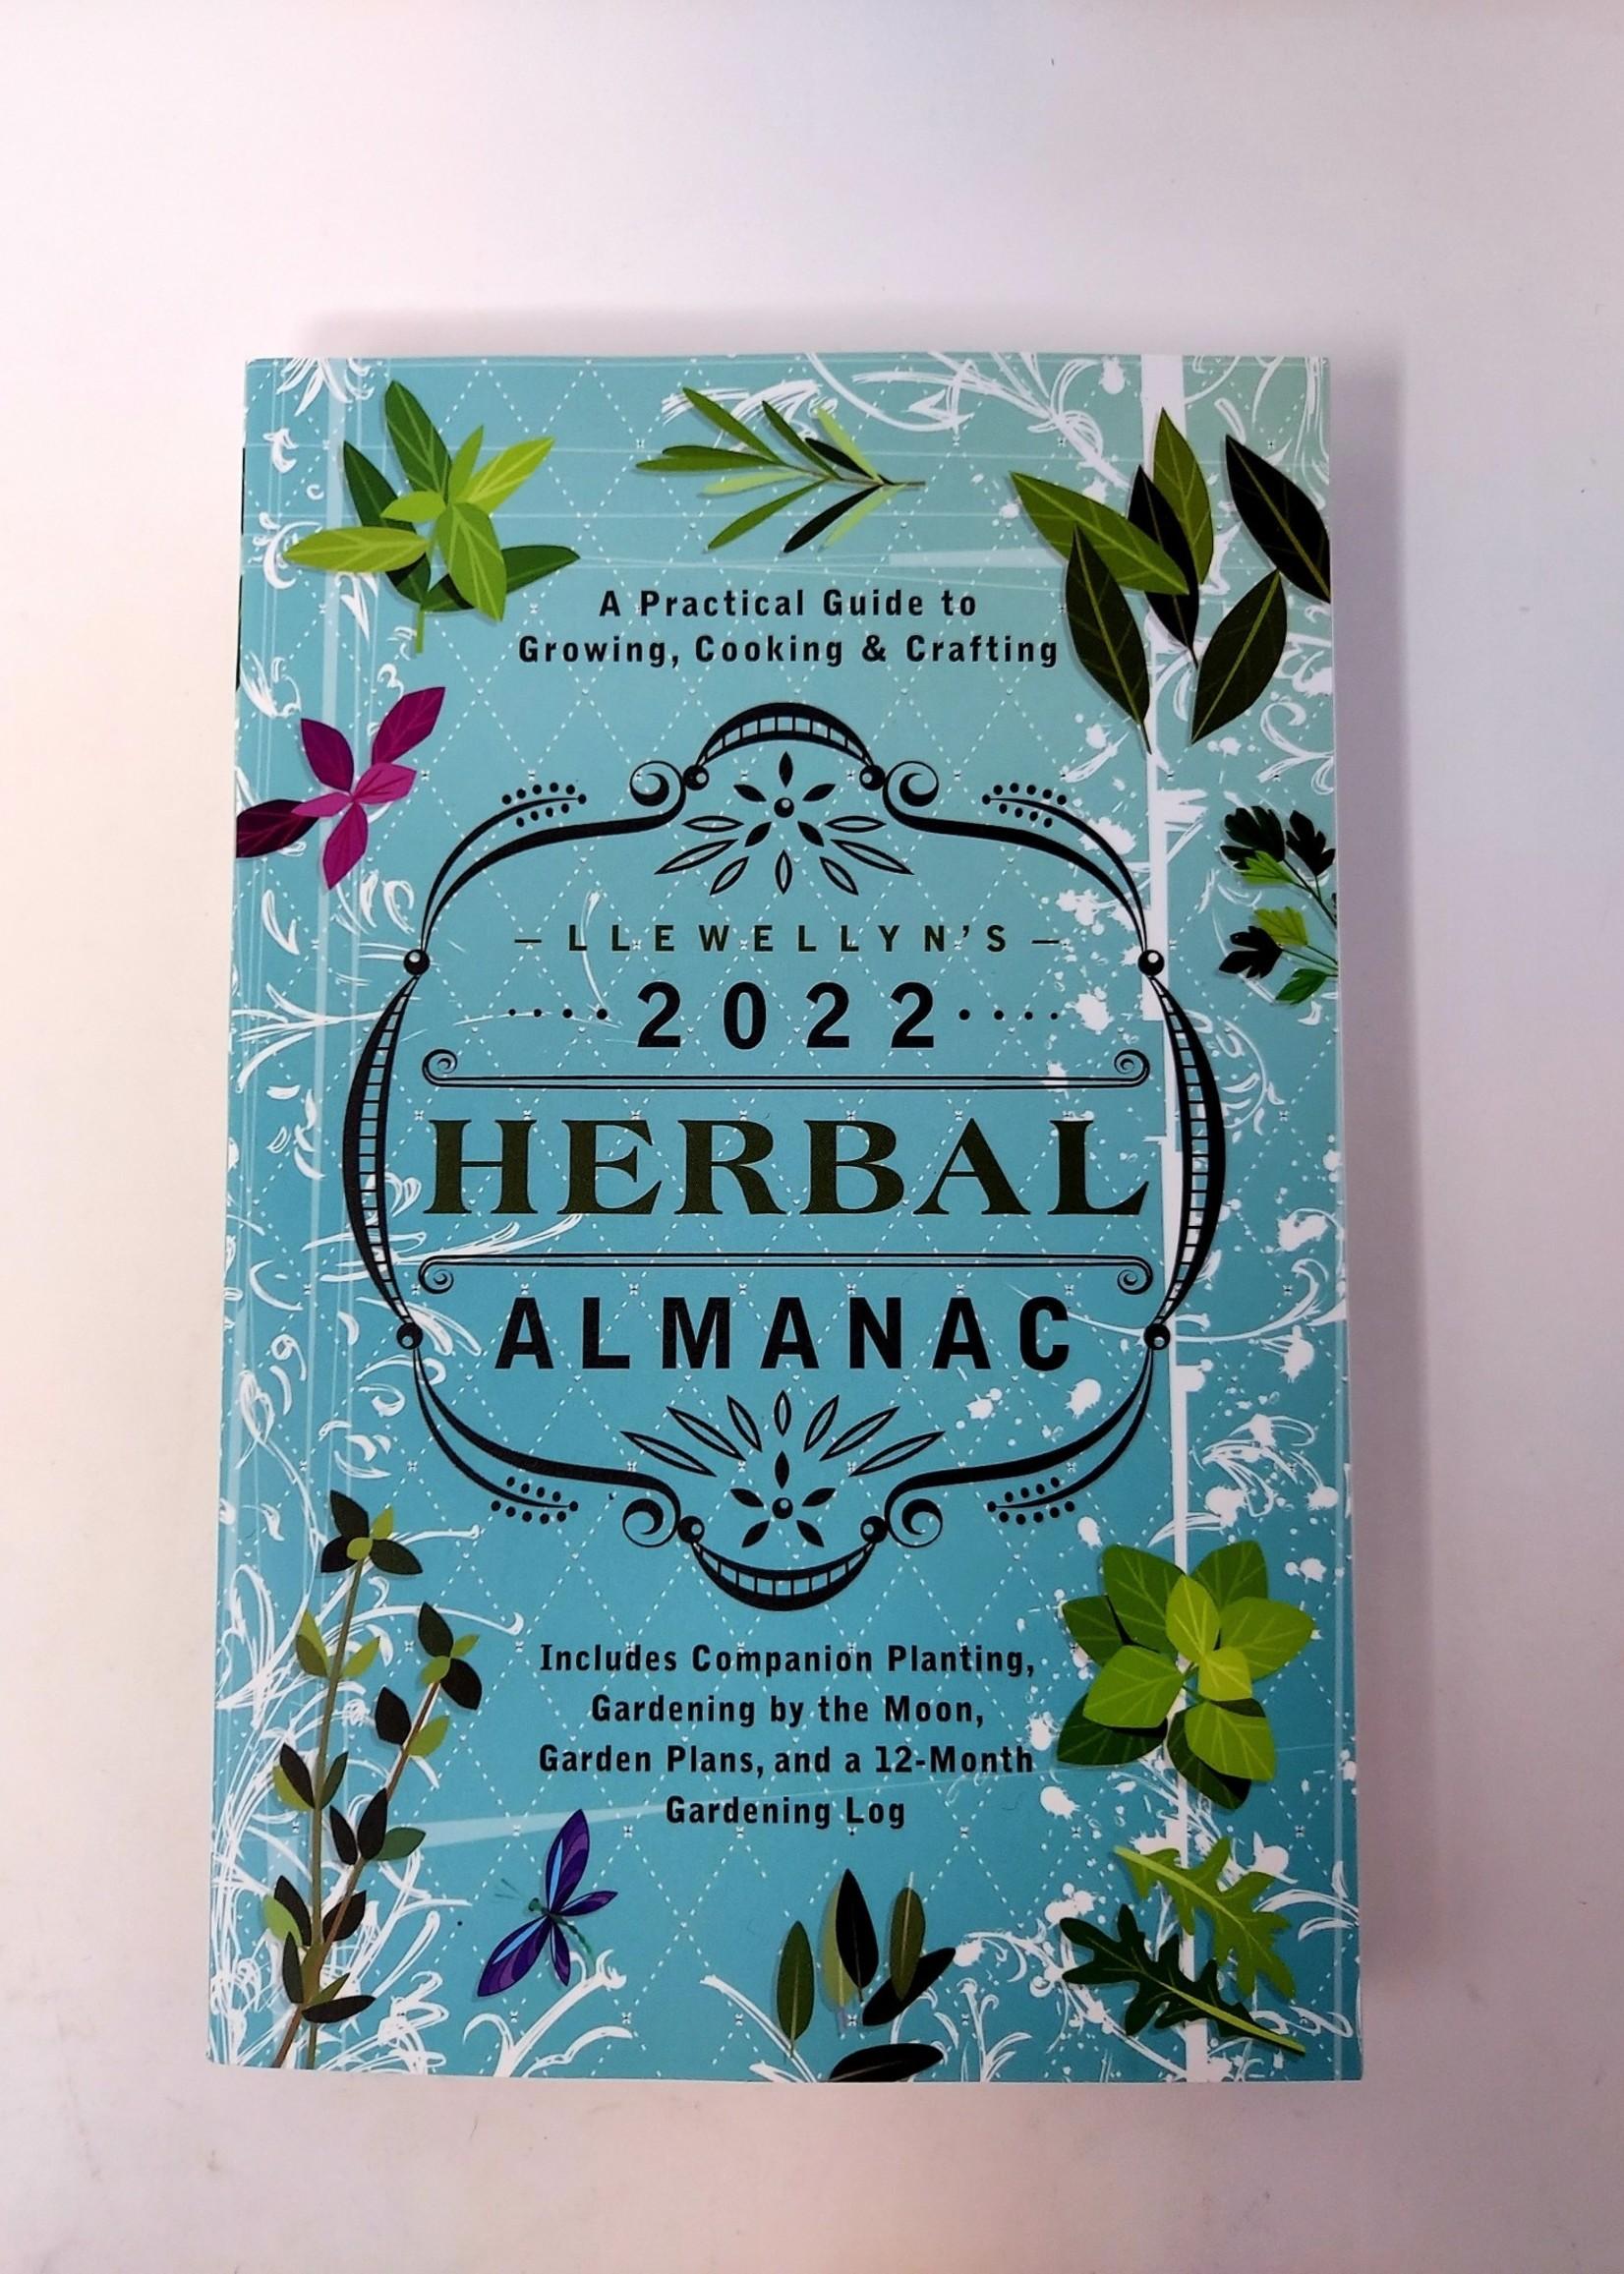 2022 Herbal Almanac-A PRACTICAL GUIDE TO GROWING, COOKING & CRAFTING